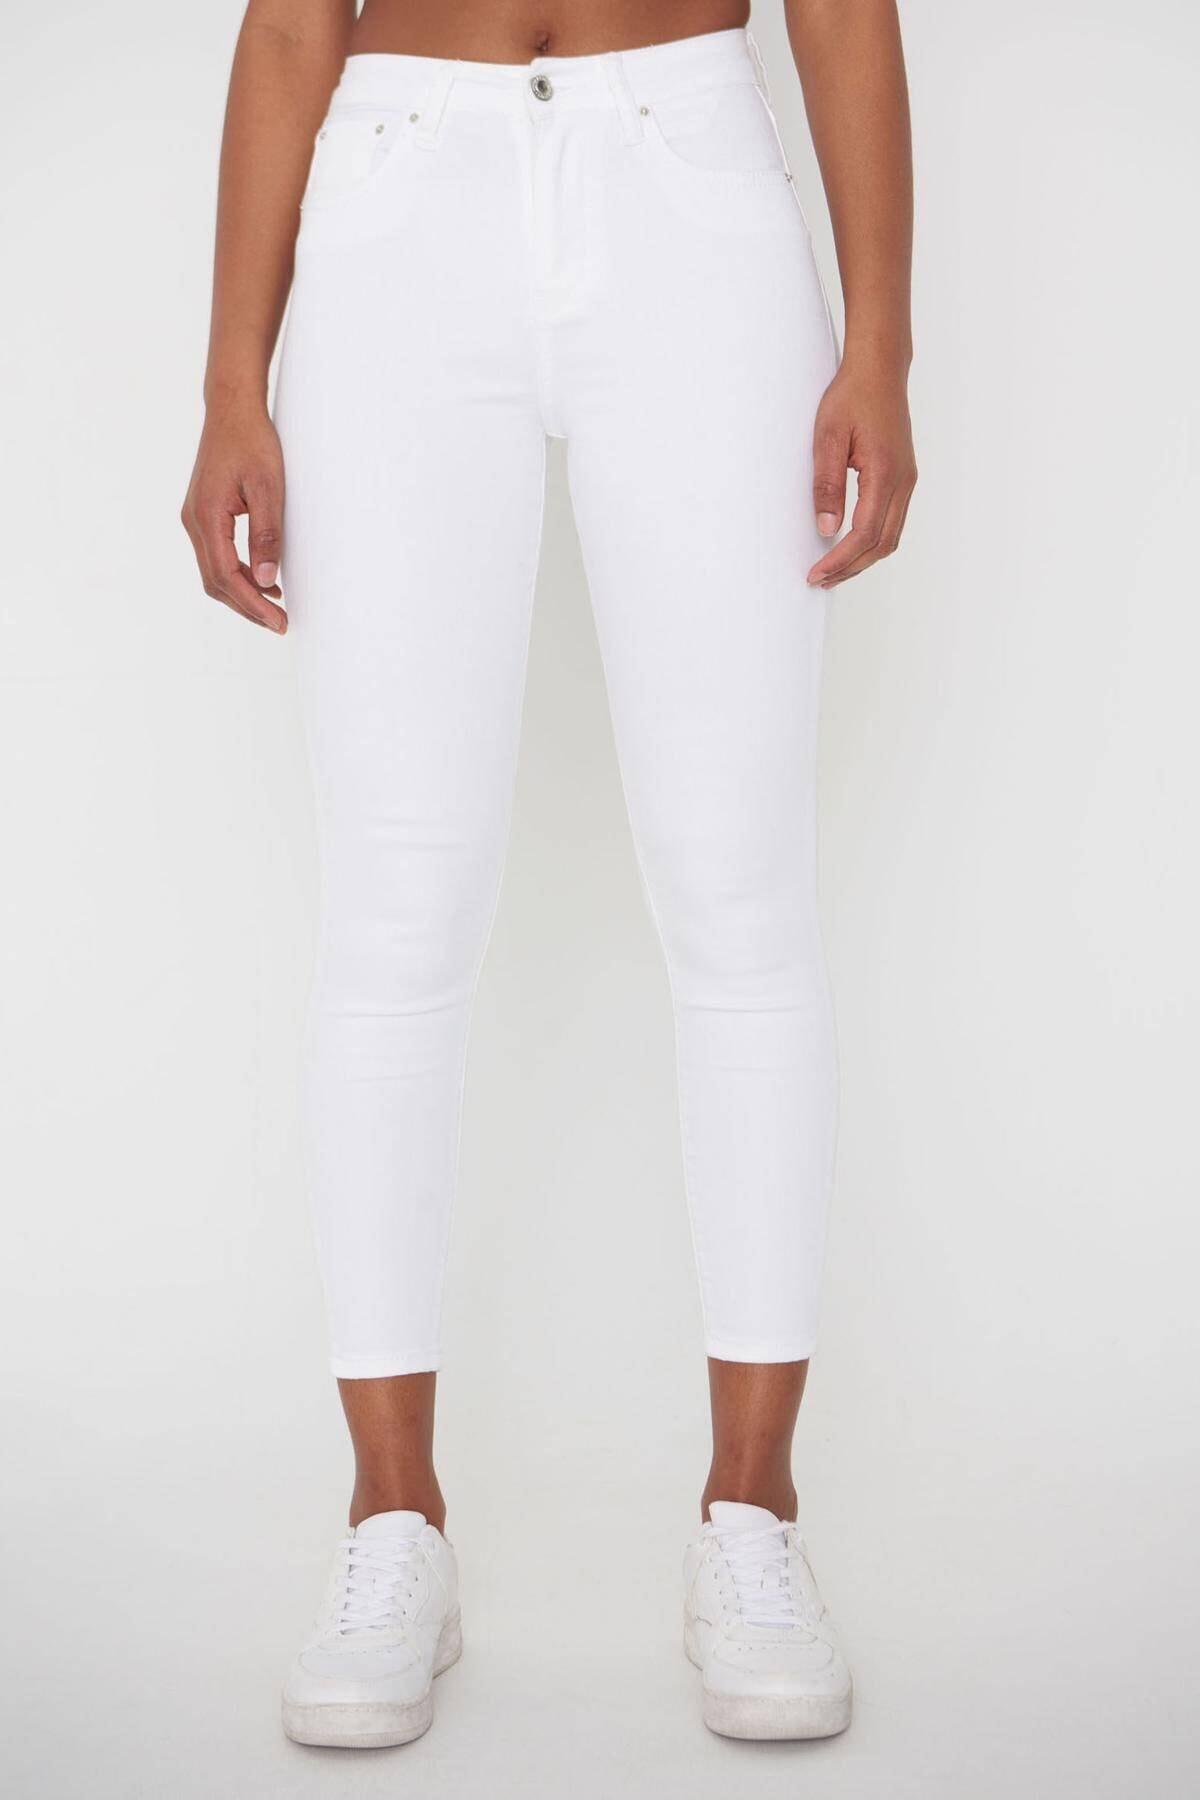 Addax Kadın Beyaz Pantolon Pn4424 - Pnj ADX-00008543 0